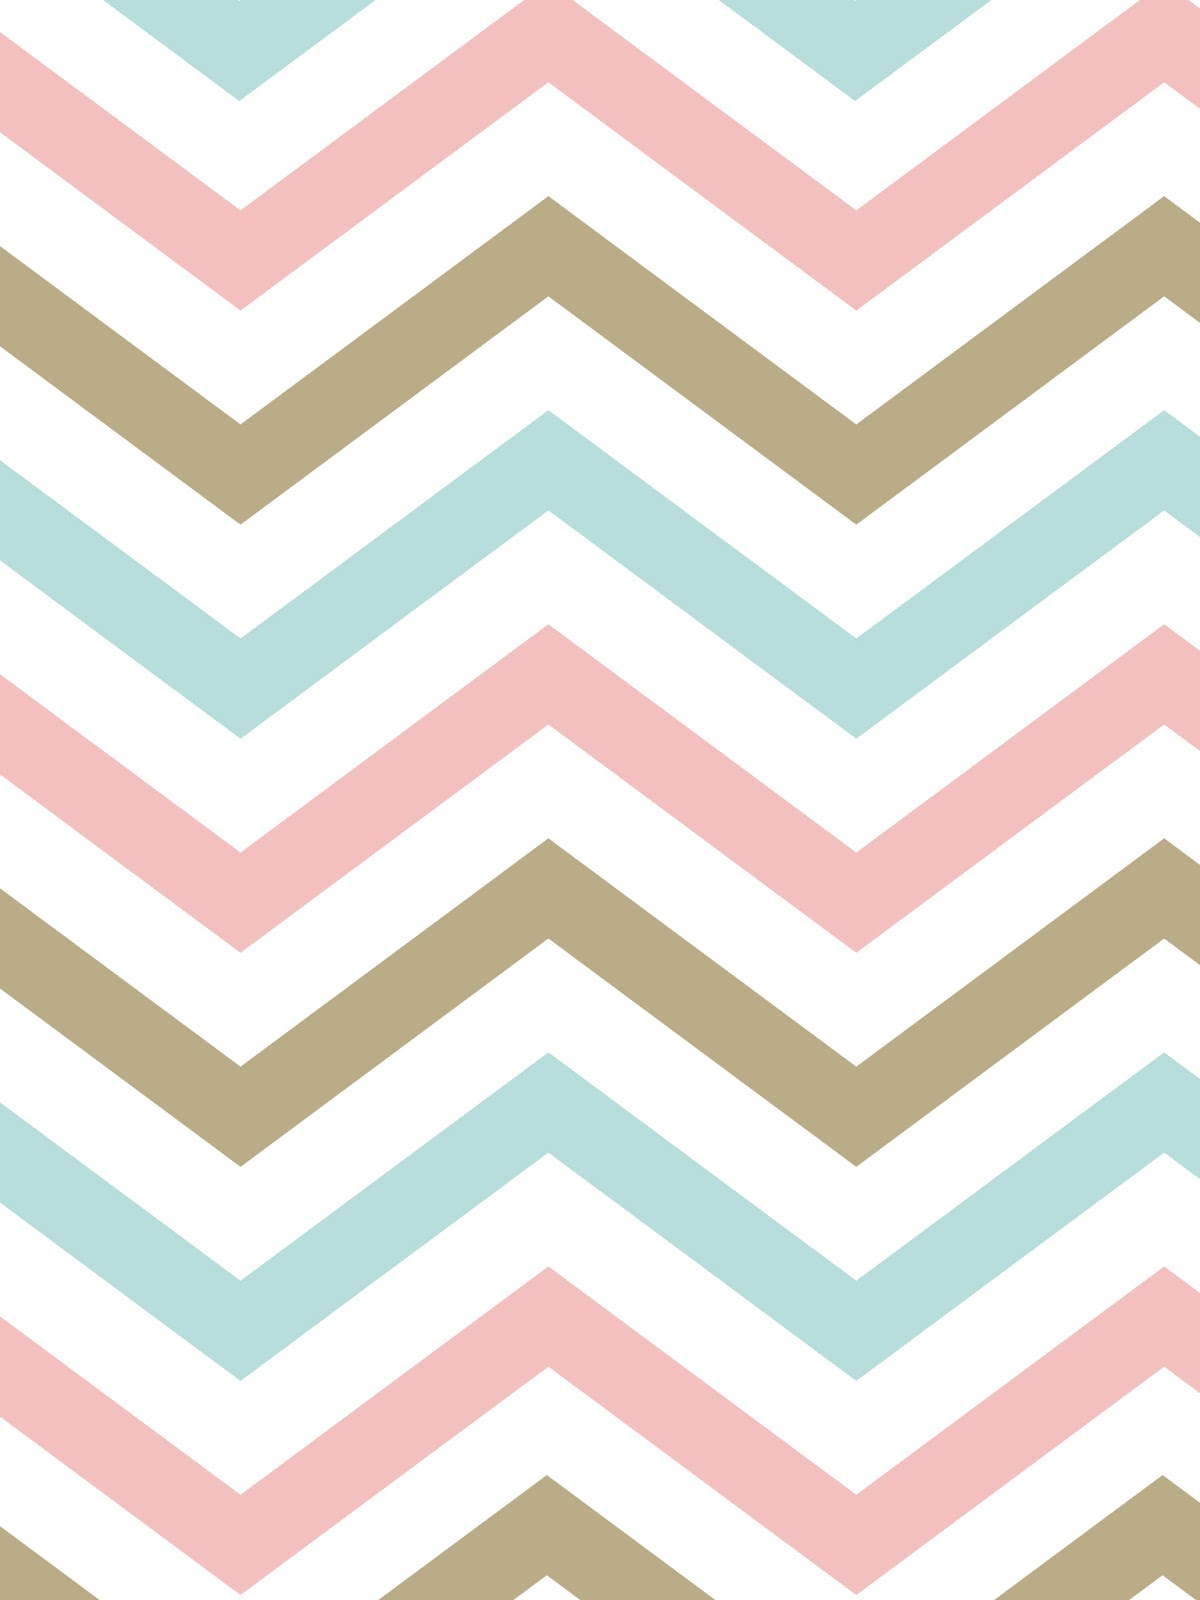 Printables BackgroundsWallpapers ChevronPink Aqua Gold 1200x1600